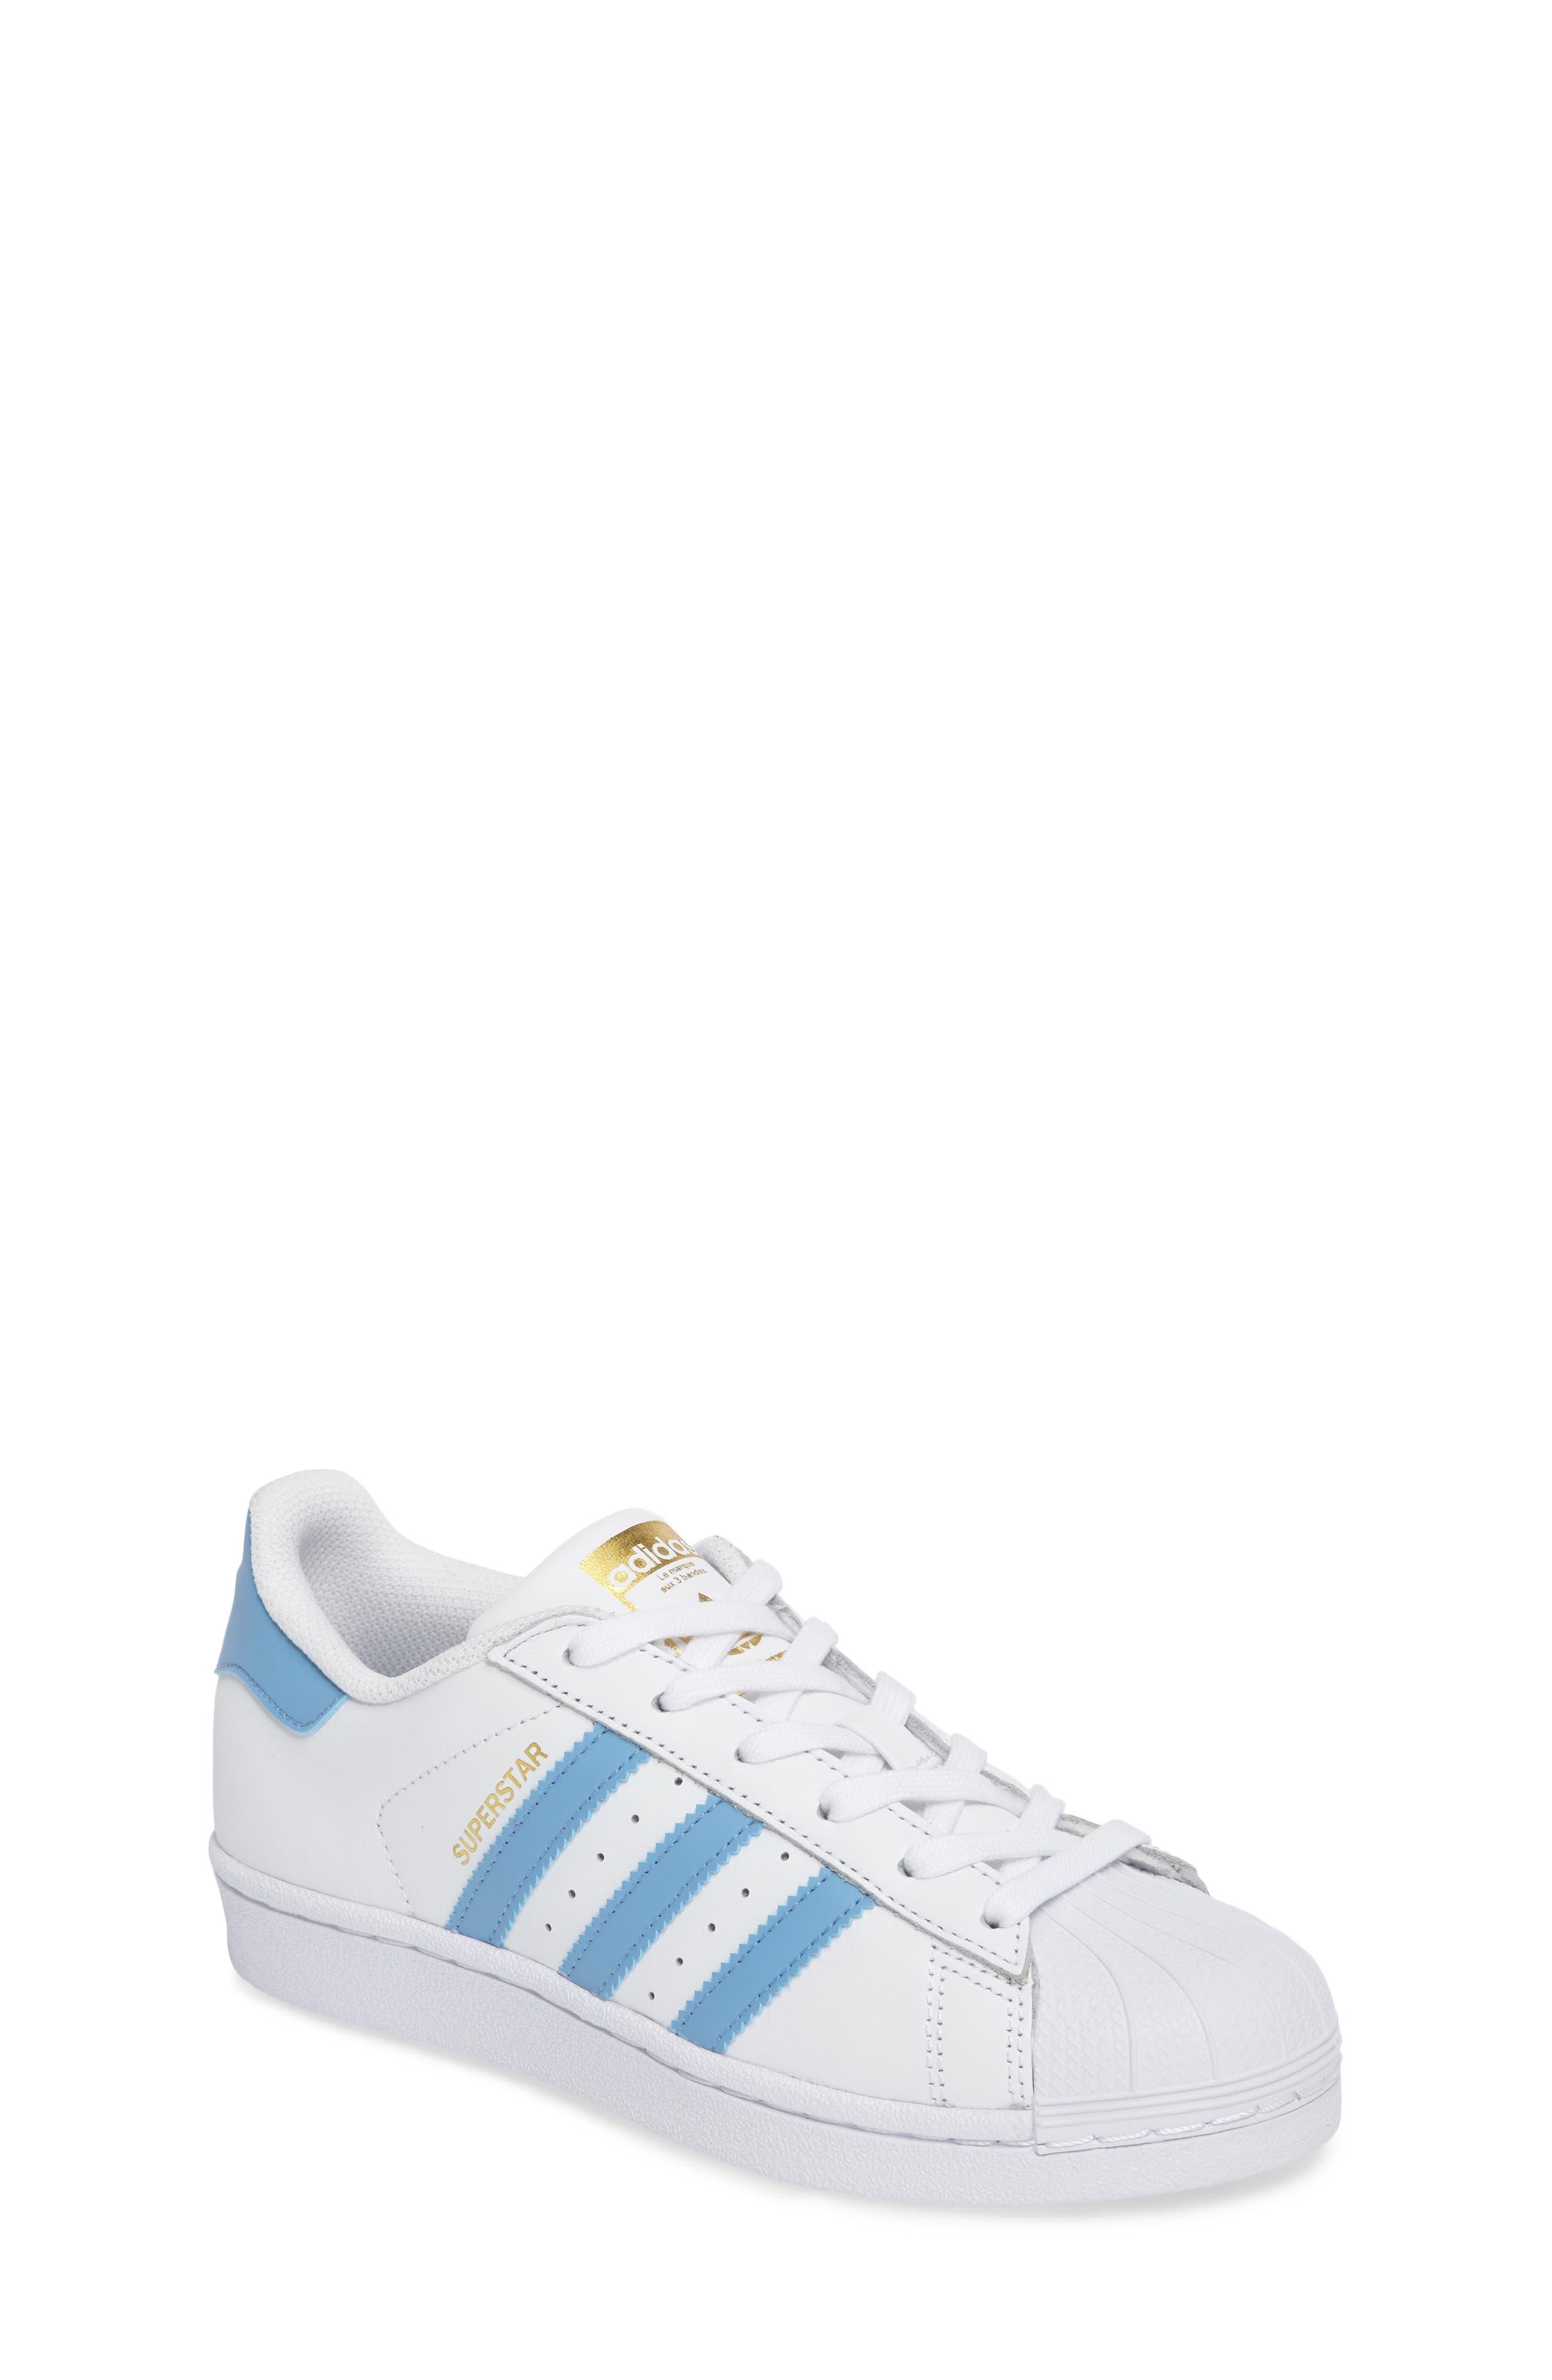 Superstar Foundation Sneaker,                         Main,                         color, White/ Light Blue/ Gold